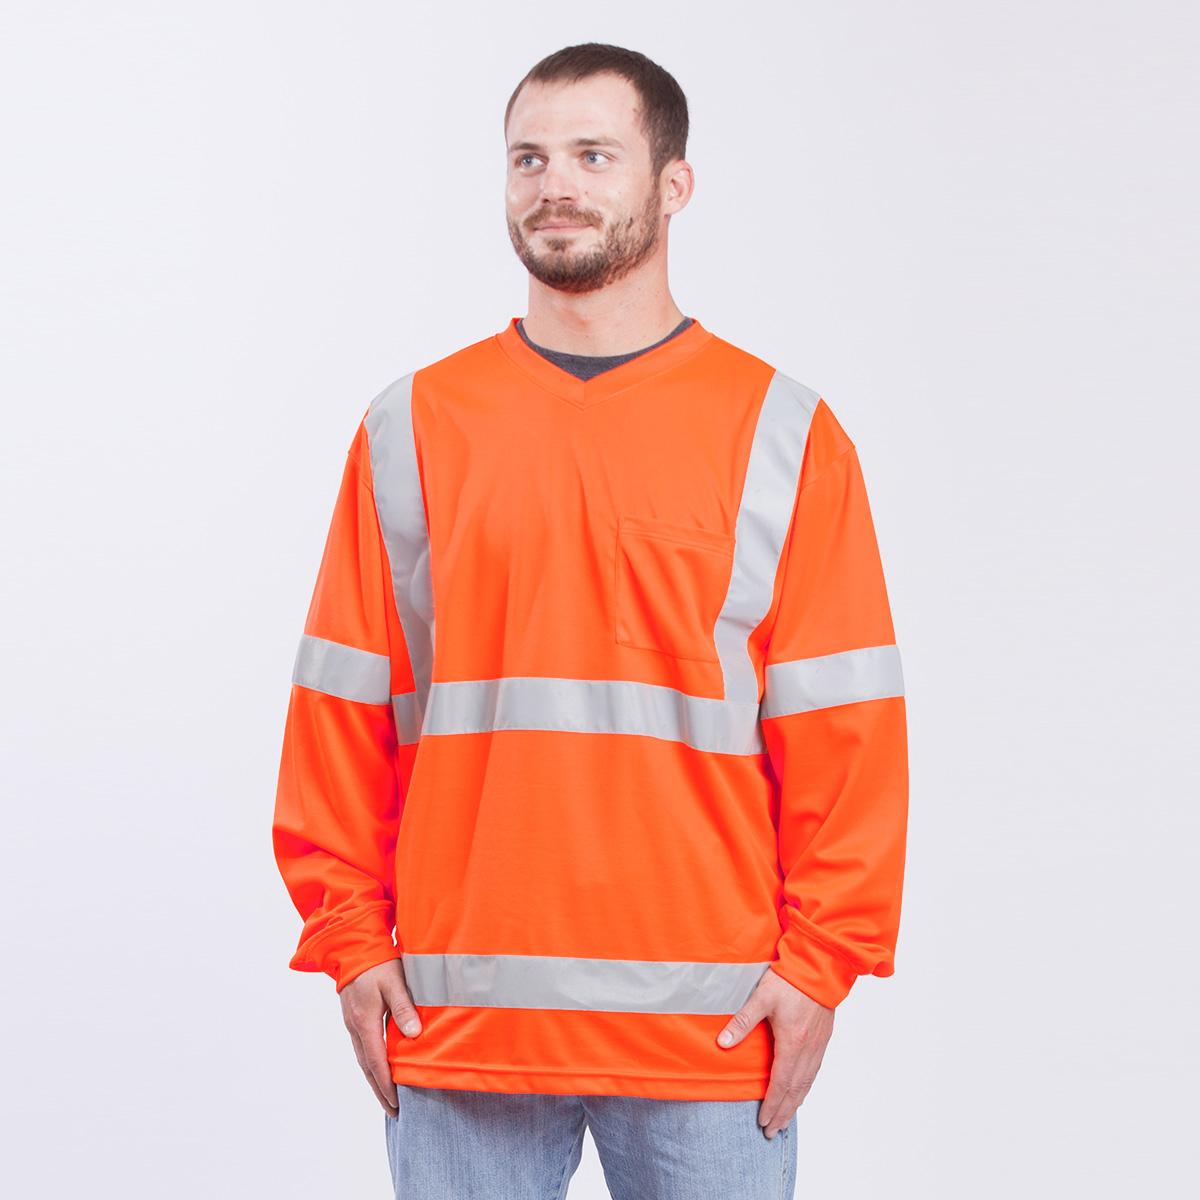 Class-III-Shirt-Long-Sleeve-Performance-Fabric-orange-front